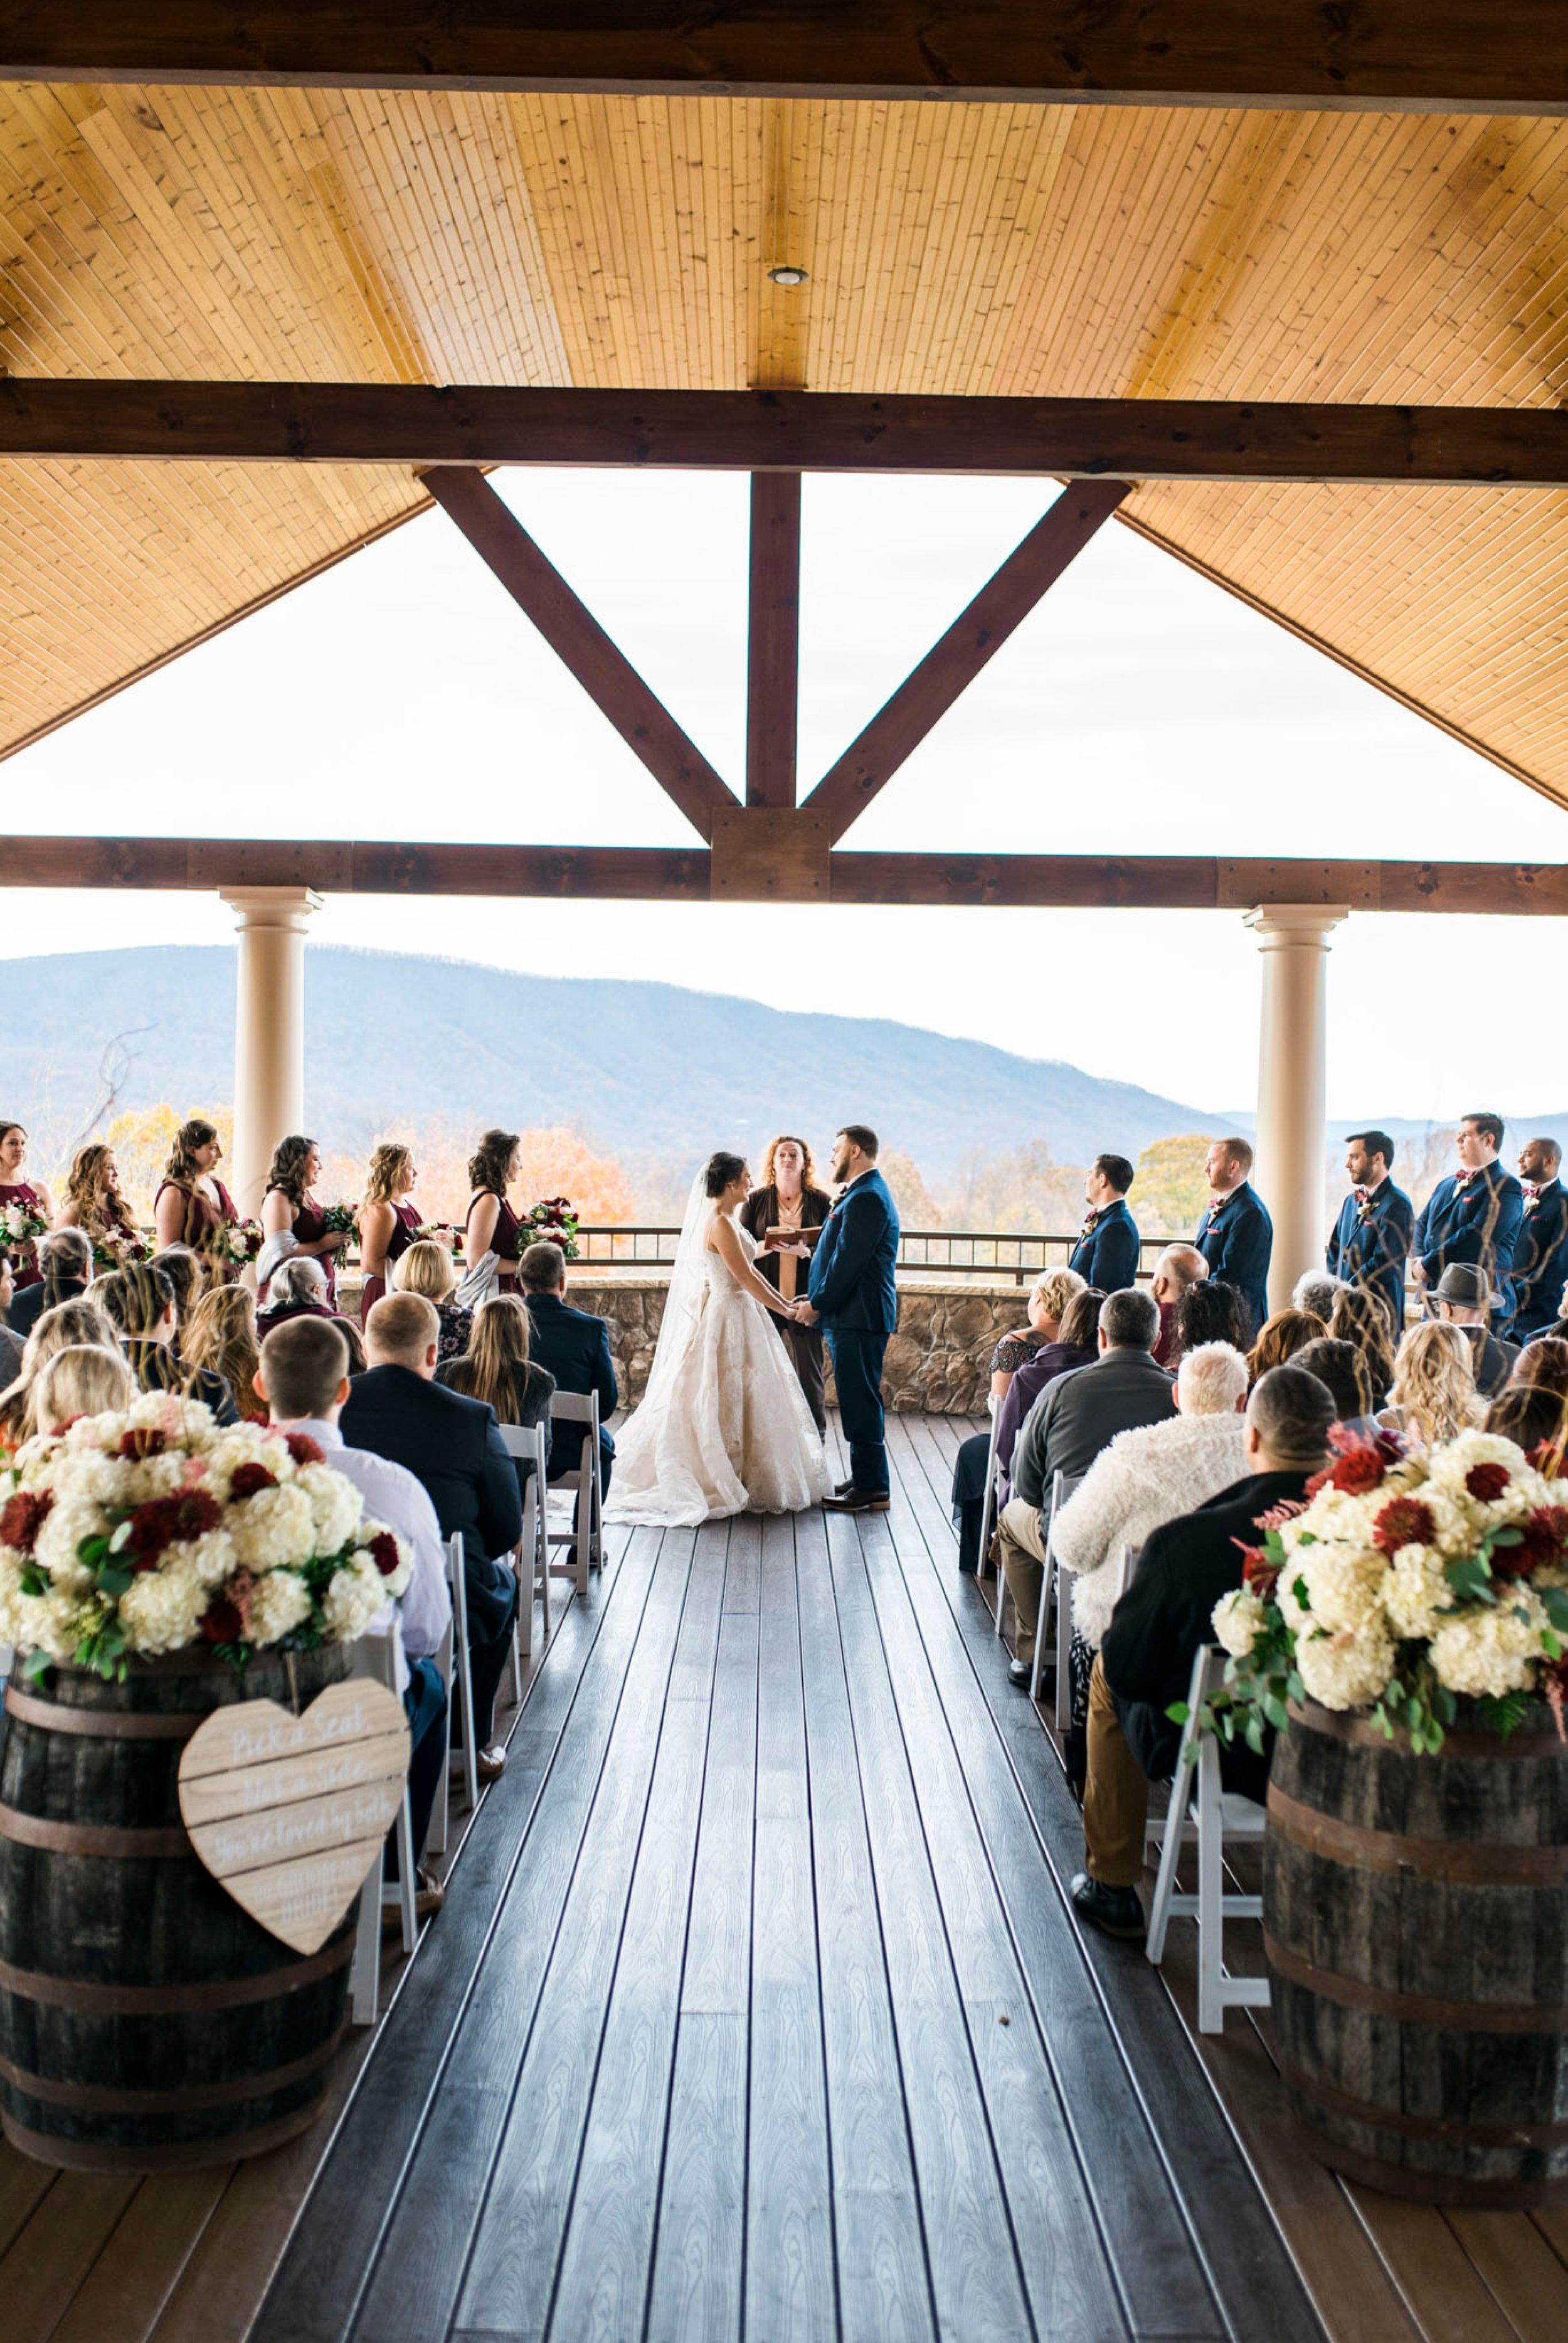 IrvineEstate_LexingtonVA_Wedding_FallWedding_VirginiaWeddingPhotographer 59.jpg